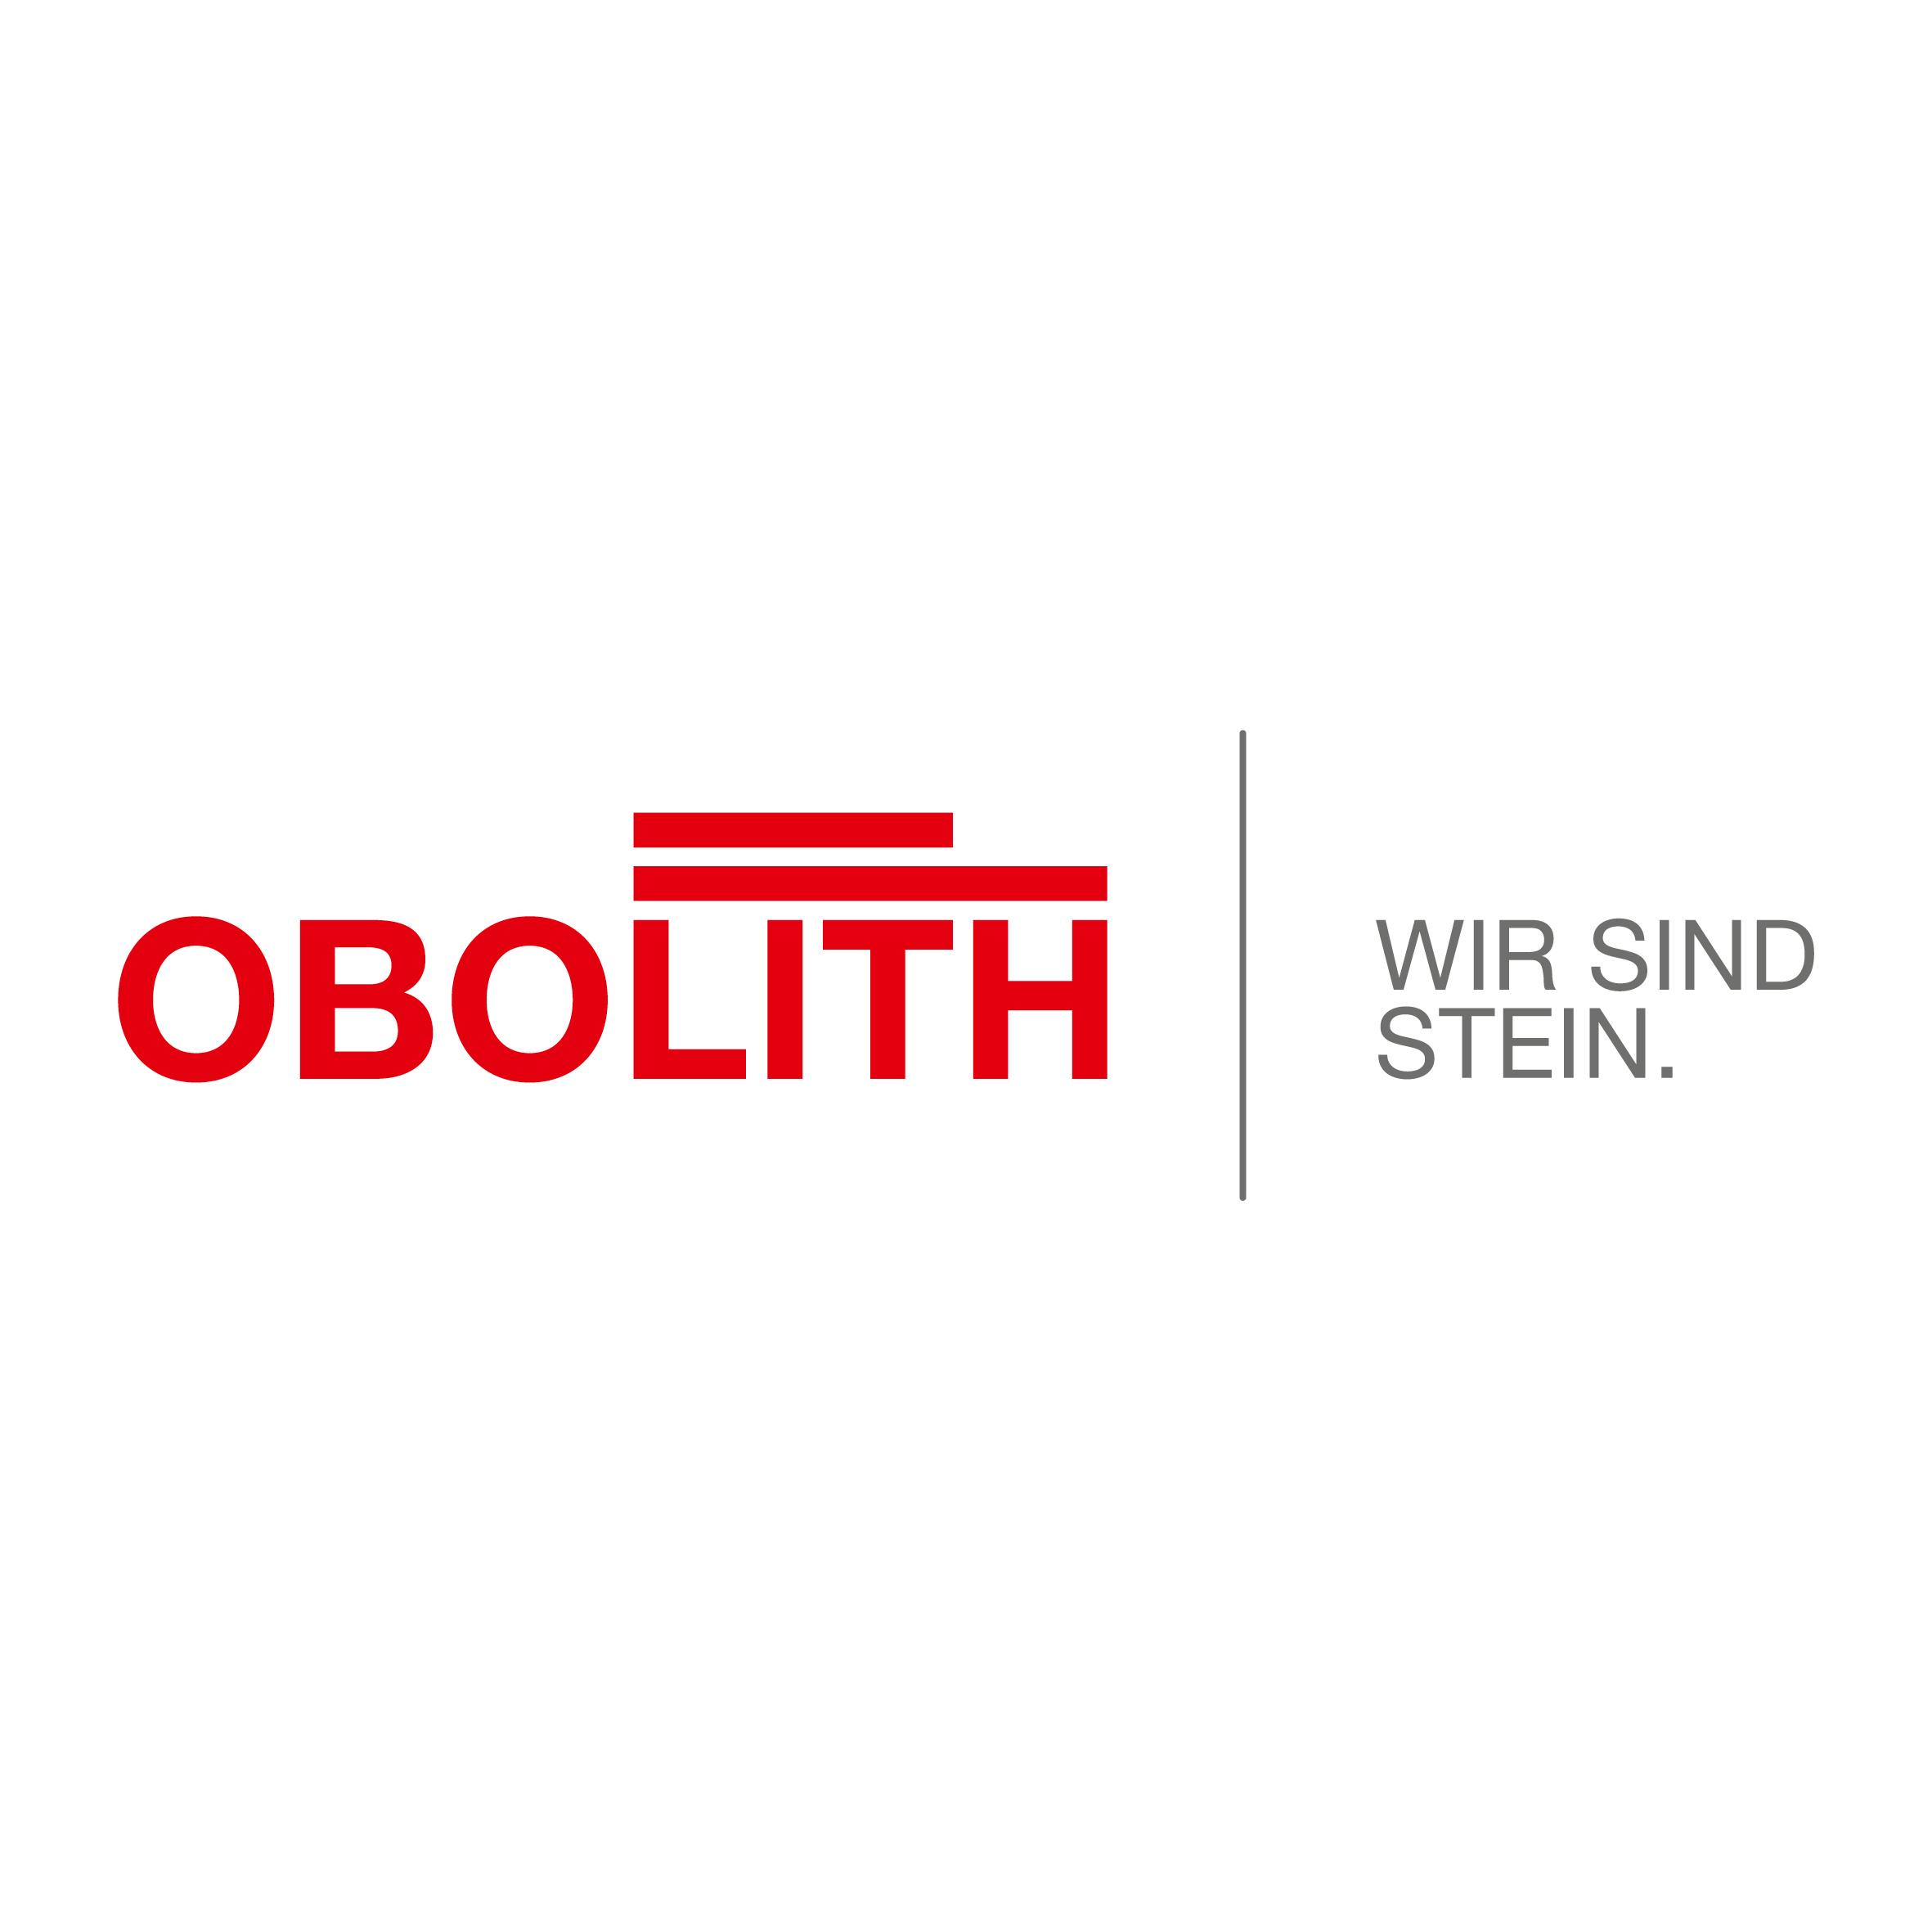 Obolith Steinwerke GmbH